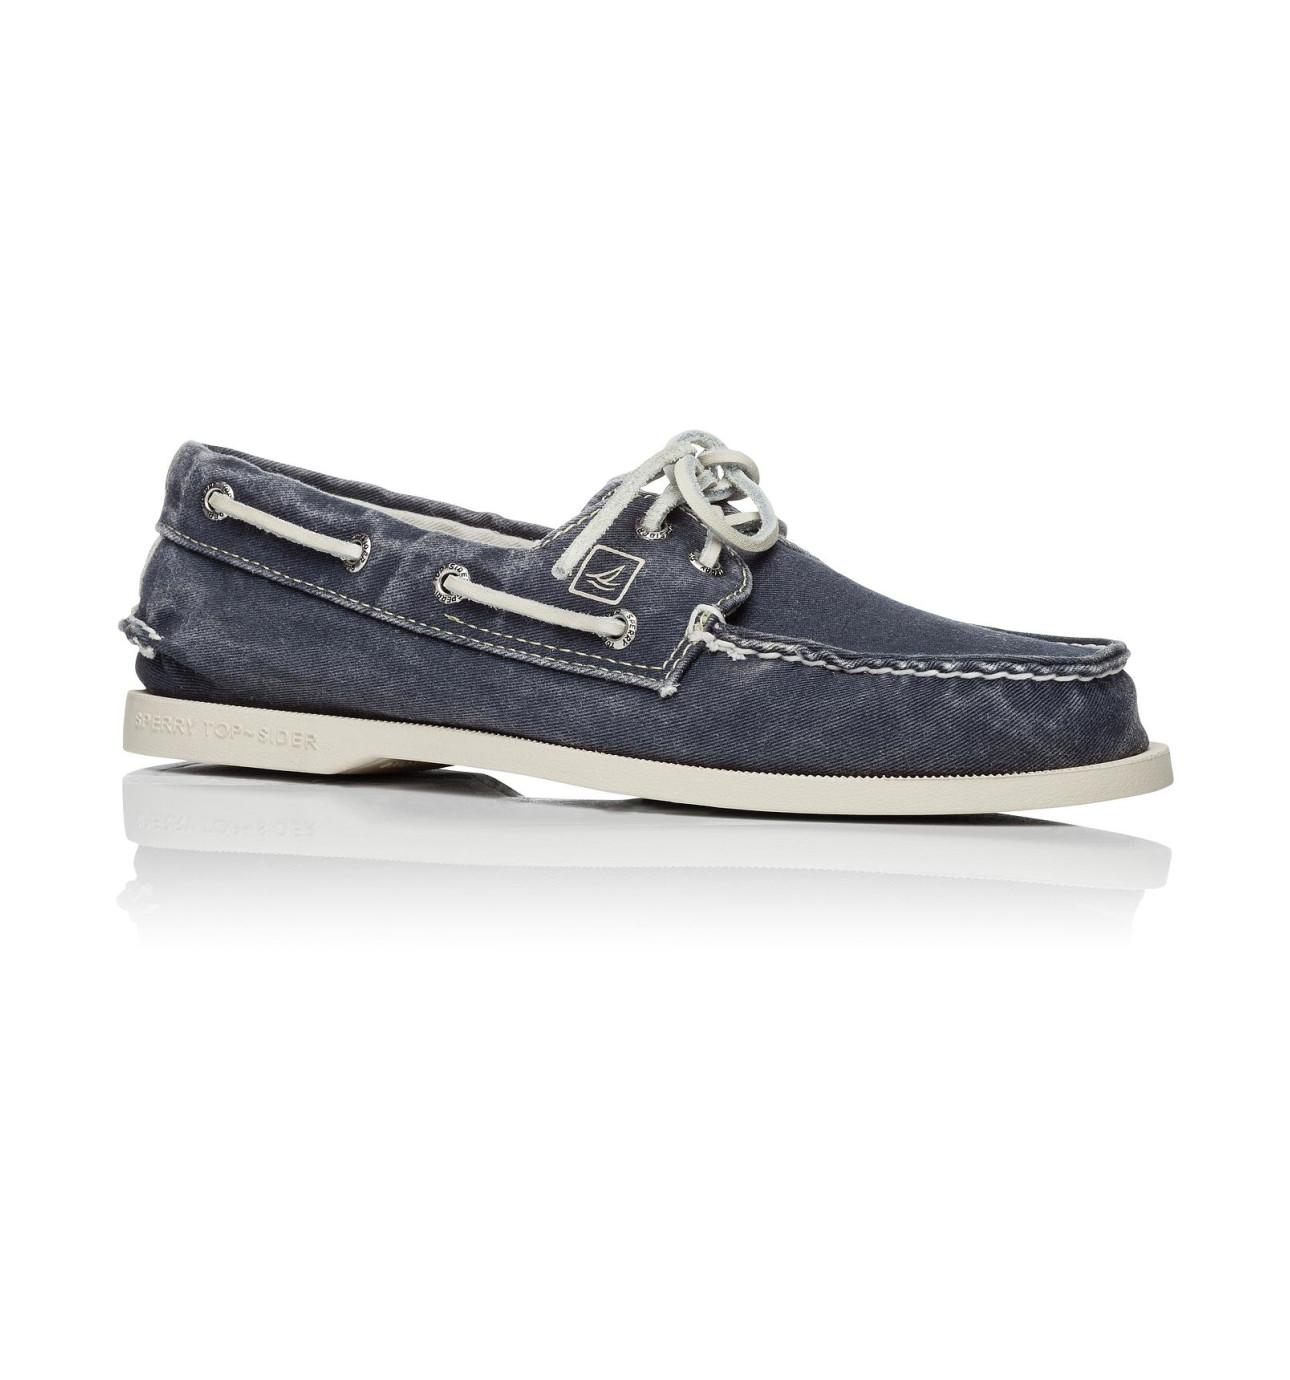 Men's Boat Shoes   Shop Designer Men Shoes   David Jones Online